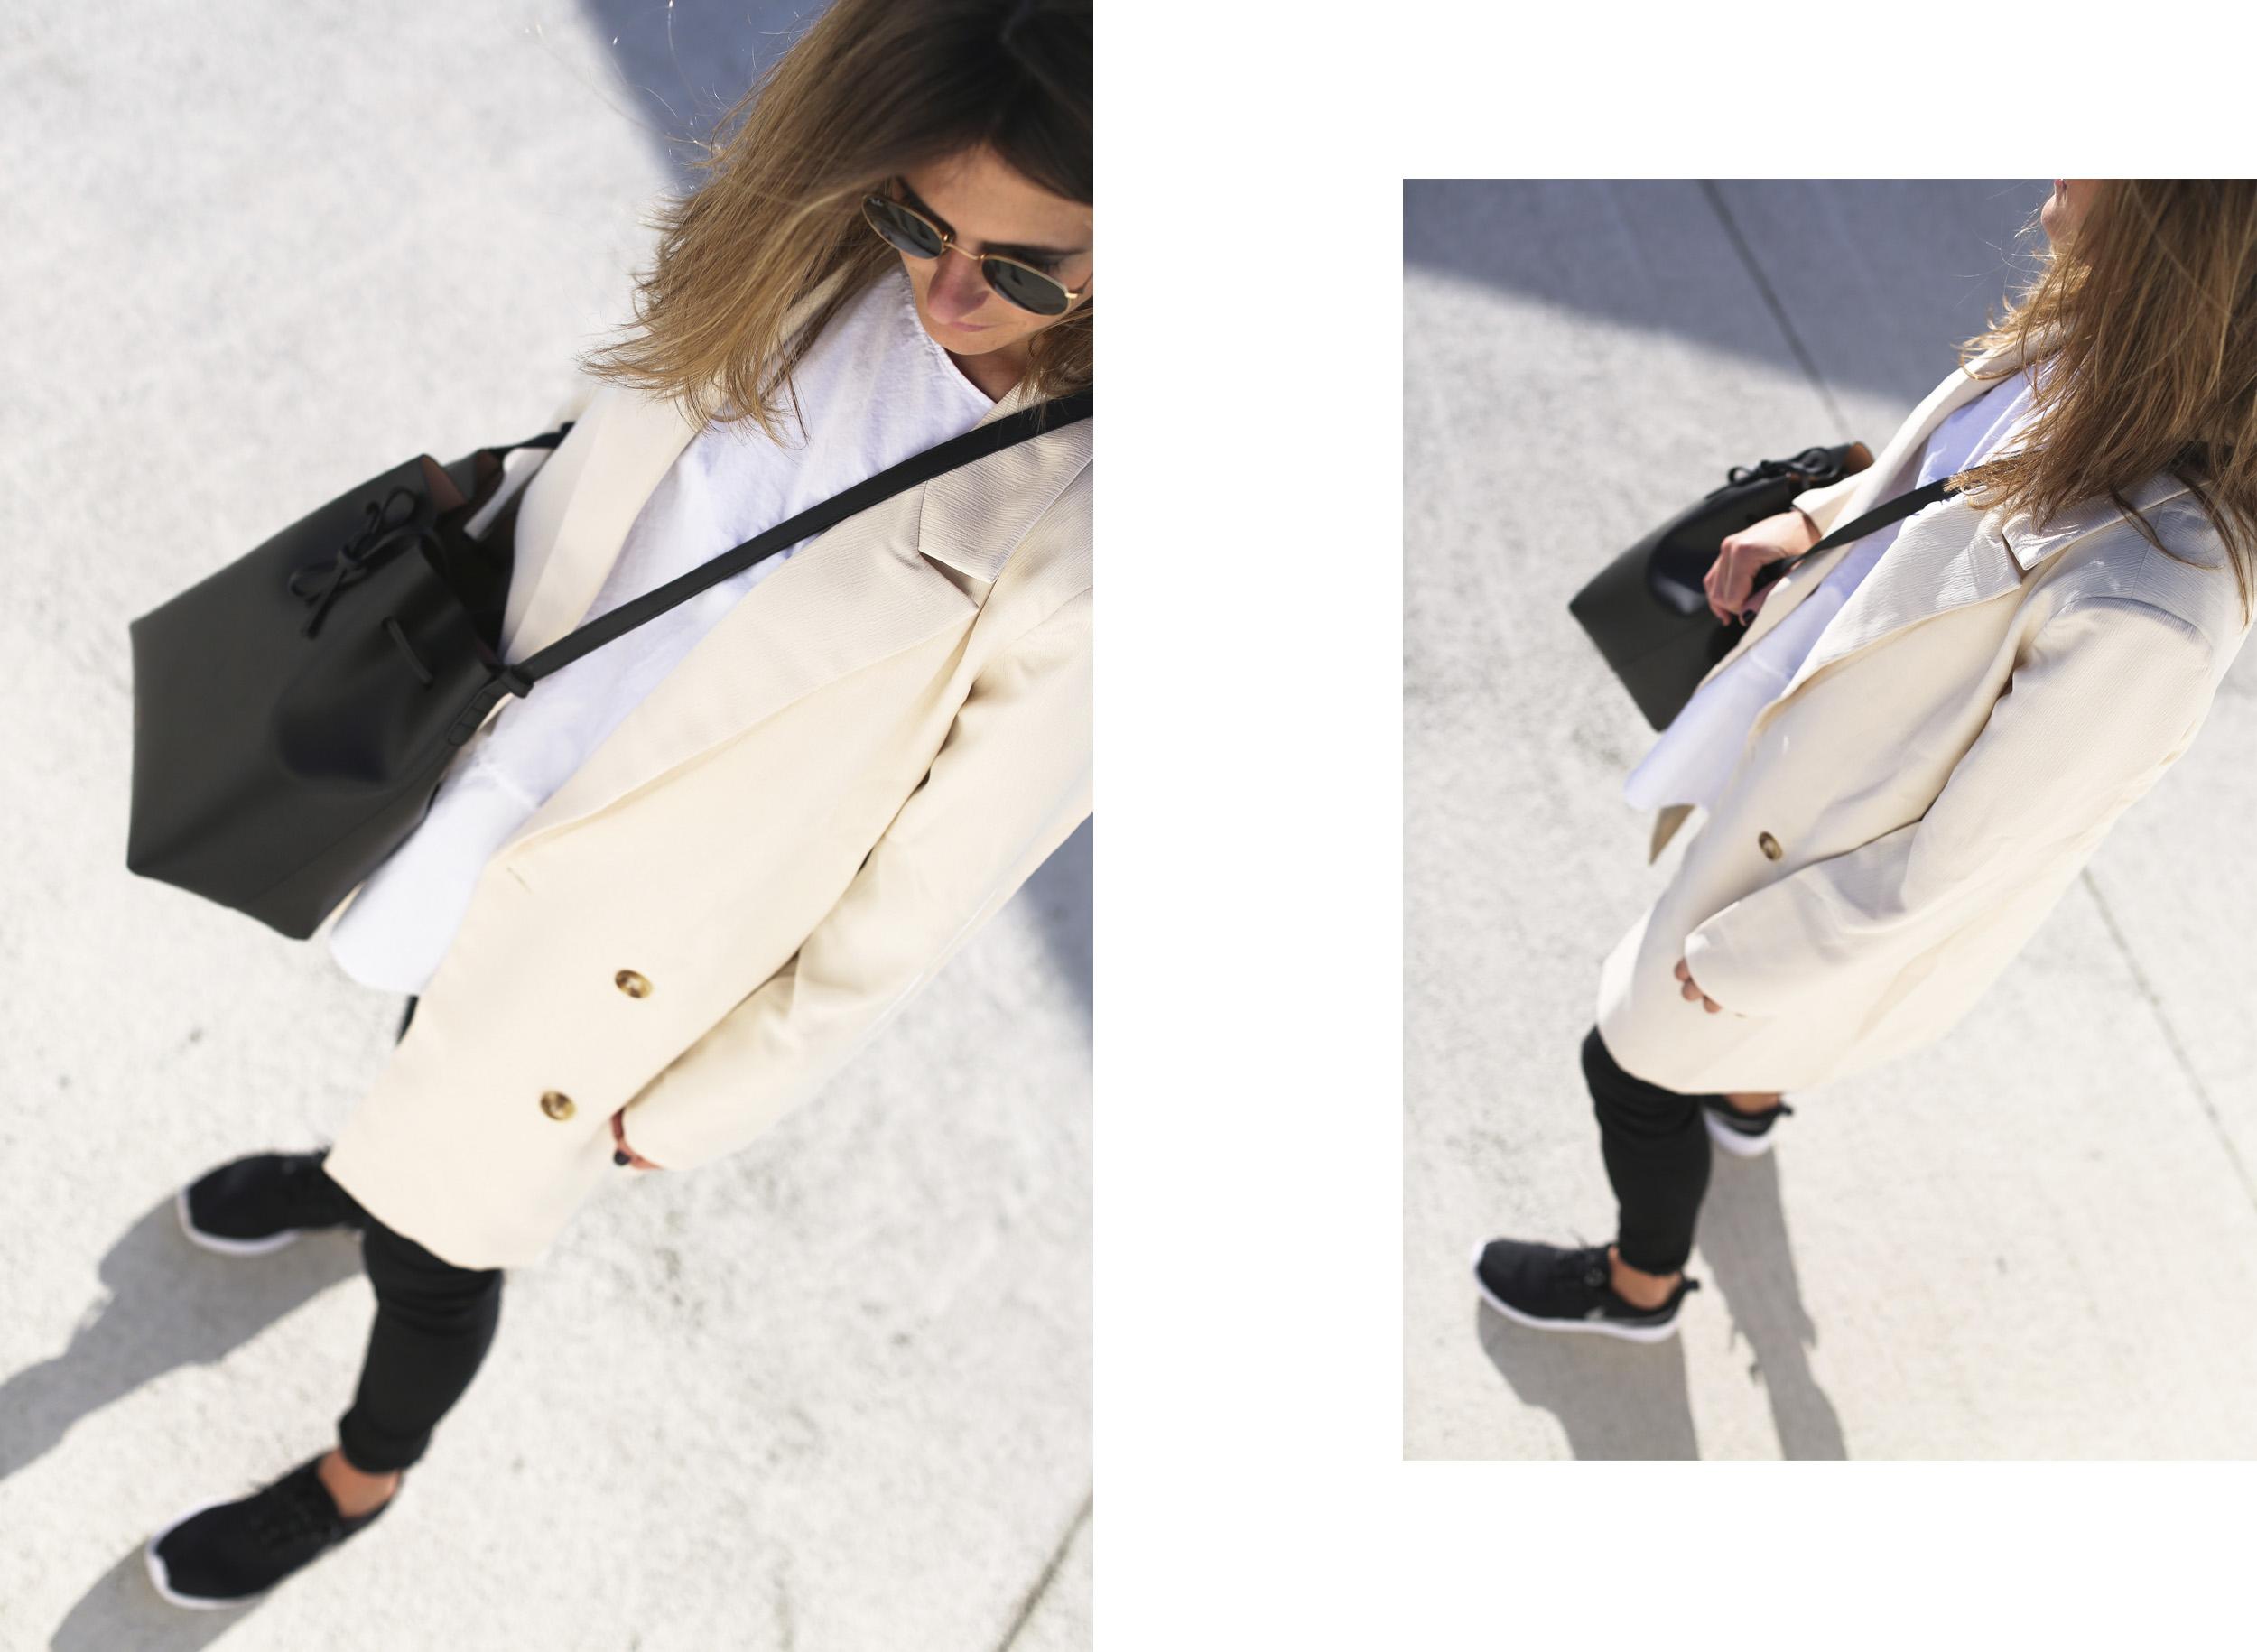 Clochet_streetstyle_chicwish_long_white_blazer_nike_roshe_one_leztinstreet_mansur_gavriel_bucket_bag-20